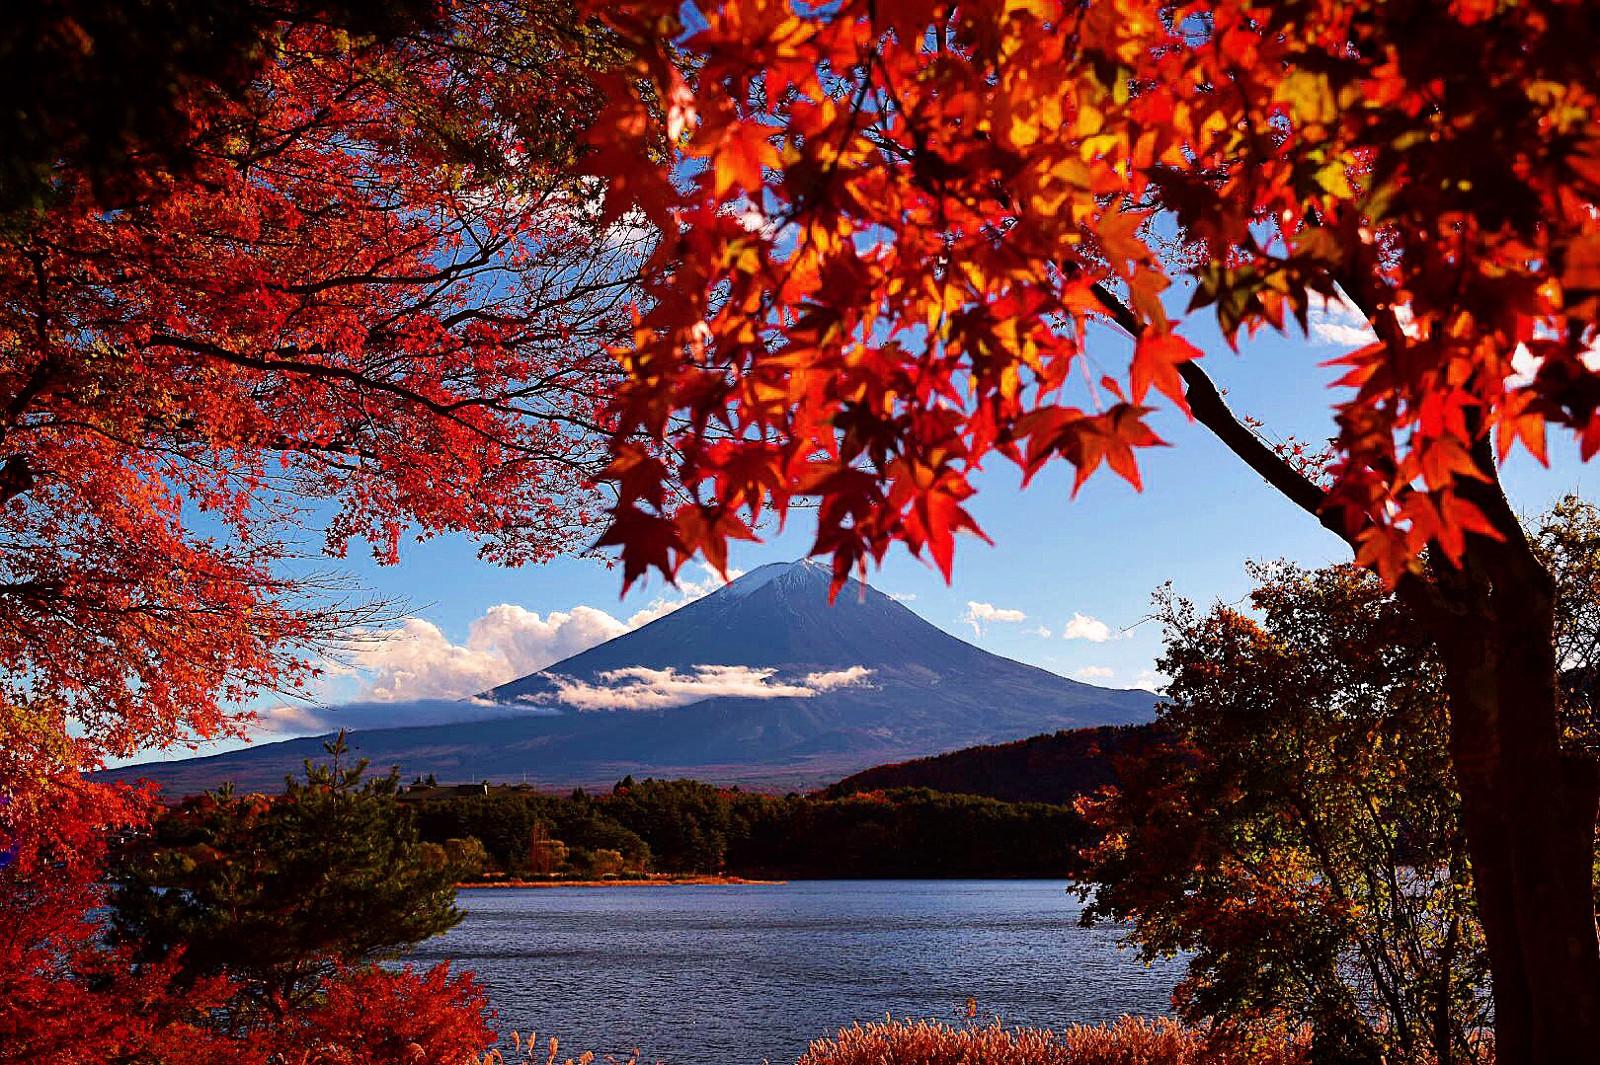 Fuji Kawaguchiko Autumn Leaves Festival 2019